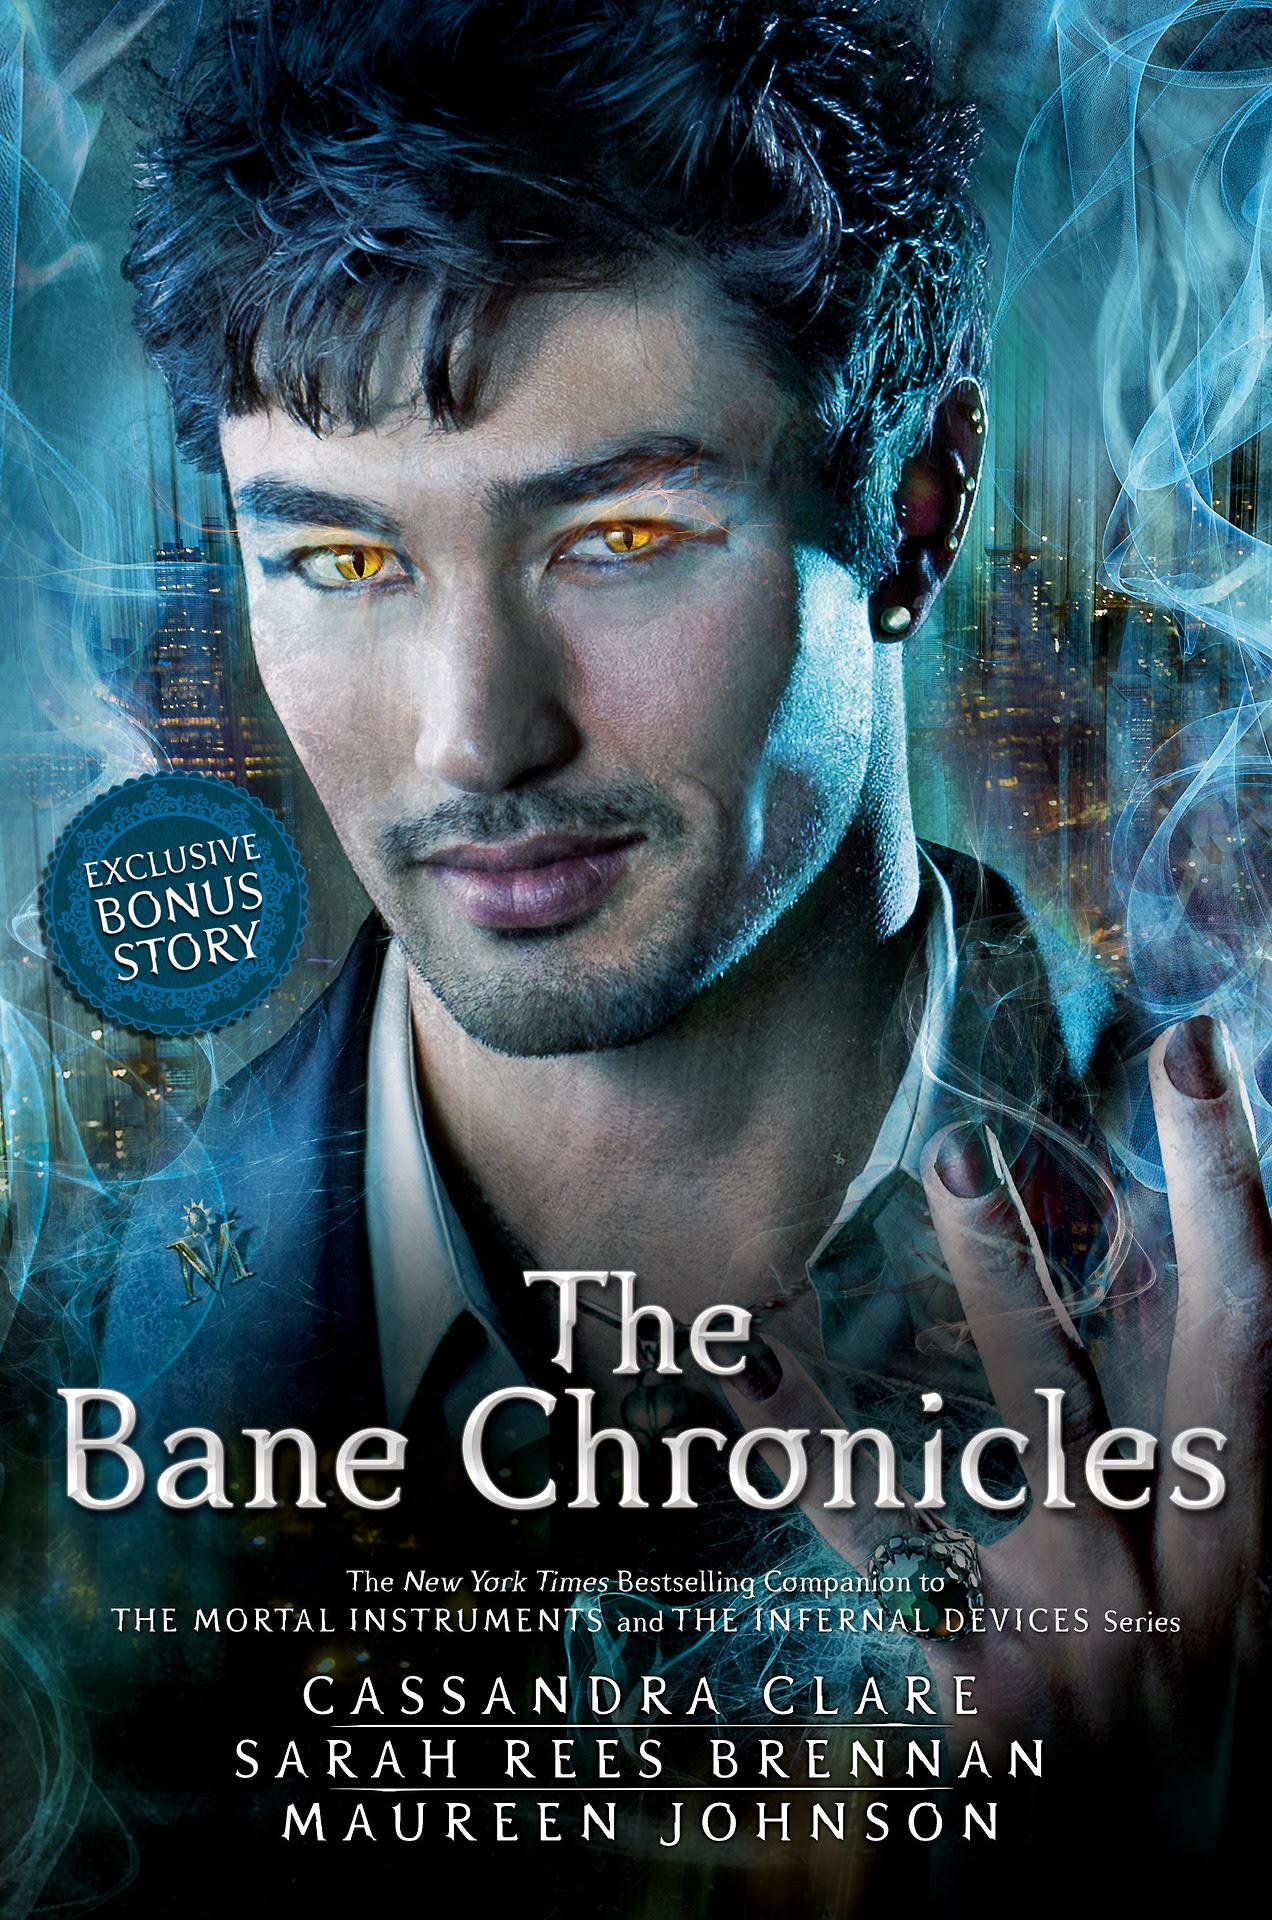 http://www.amazon.it/The-Bane-Chronicles-Cassandra-Clare/dp/1442495995/ref=tmm_hrd_title_1?ie=UTF8&qid=1435739666&sr=1-1